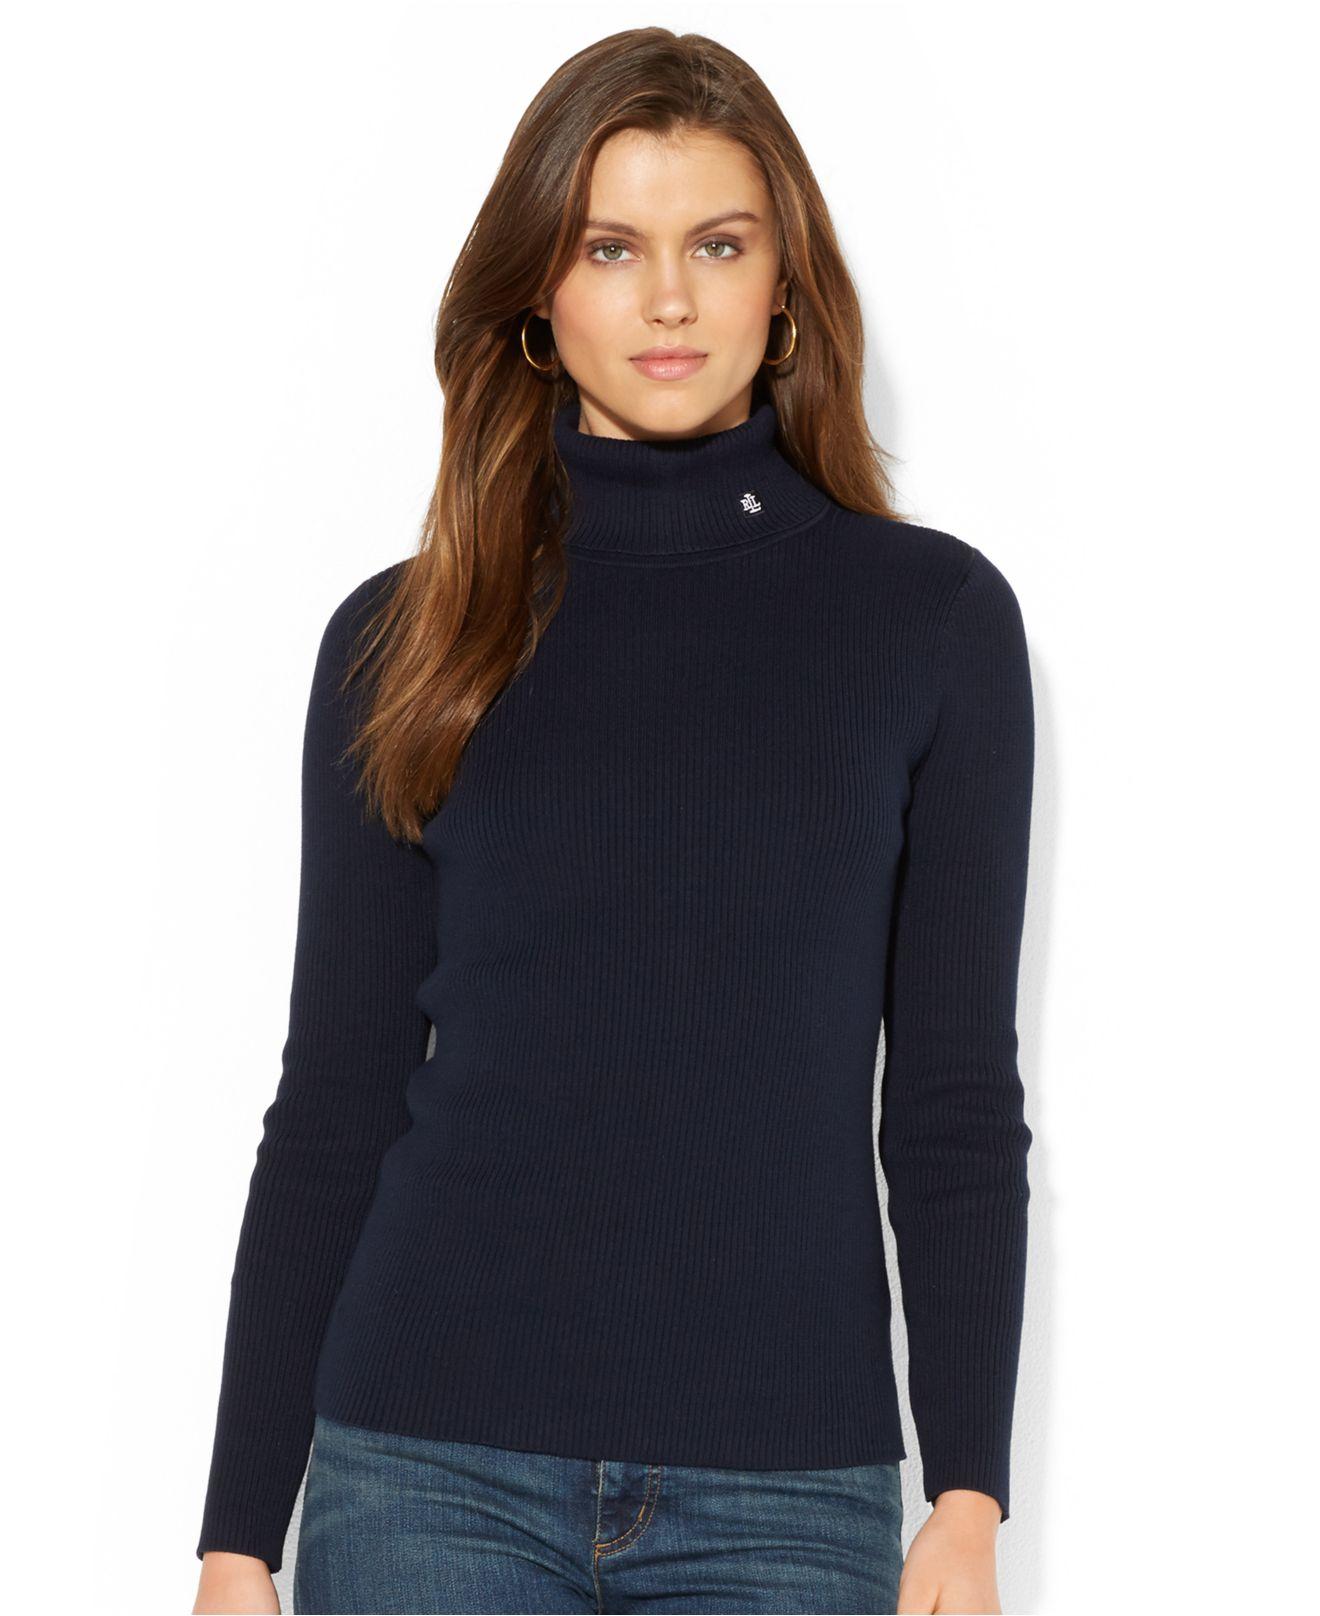 Ralph Lauren Turtleneck Sweater - Long Sweater Jacket